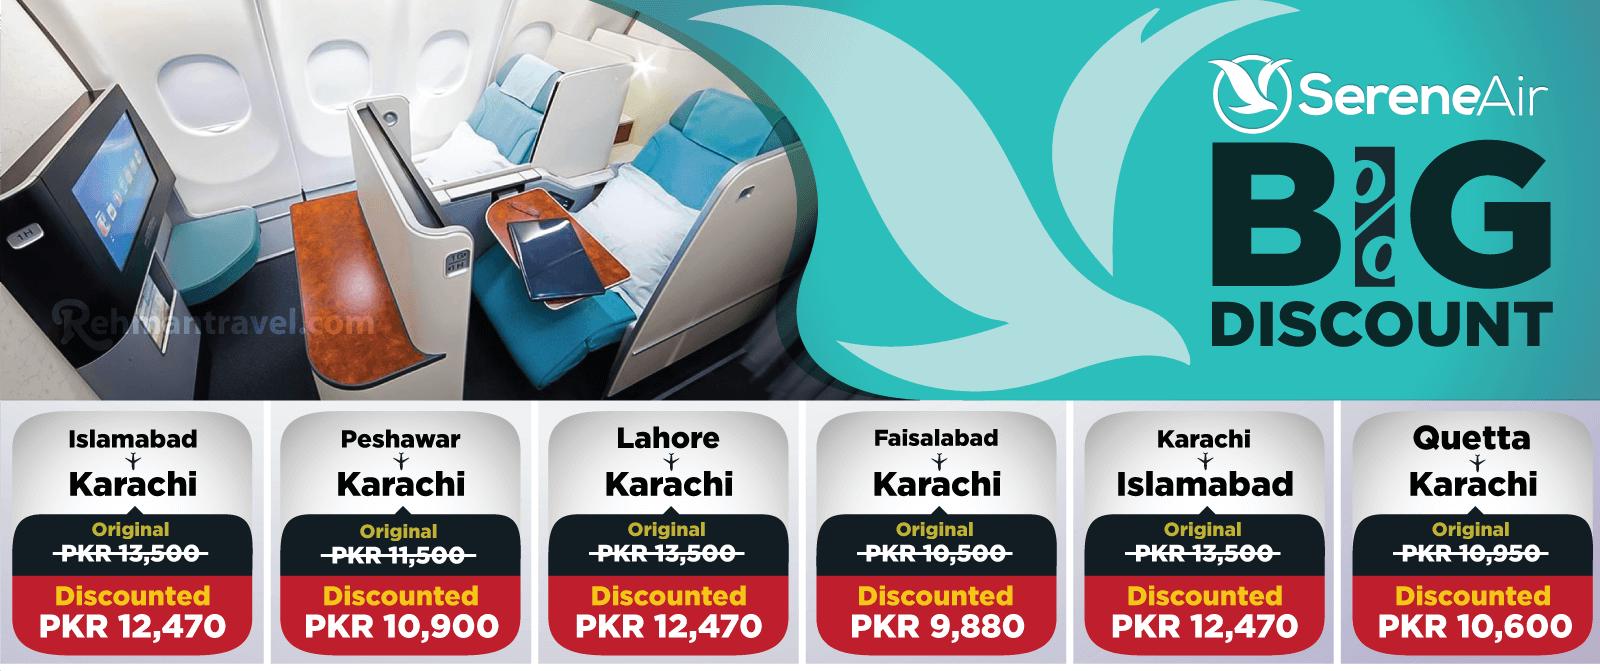 Serene air   Serene airline ticket price   Cheap air tickets